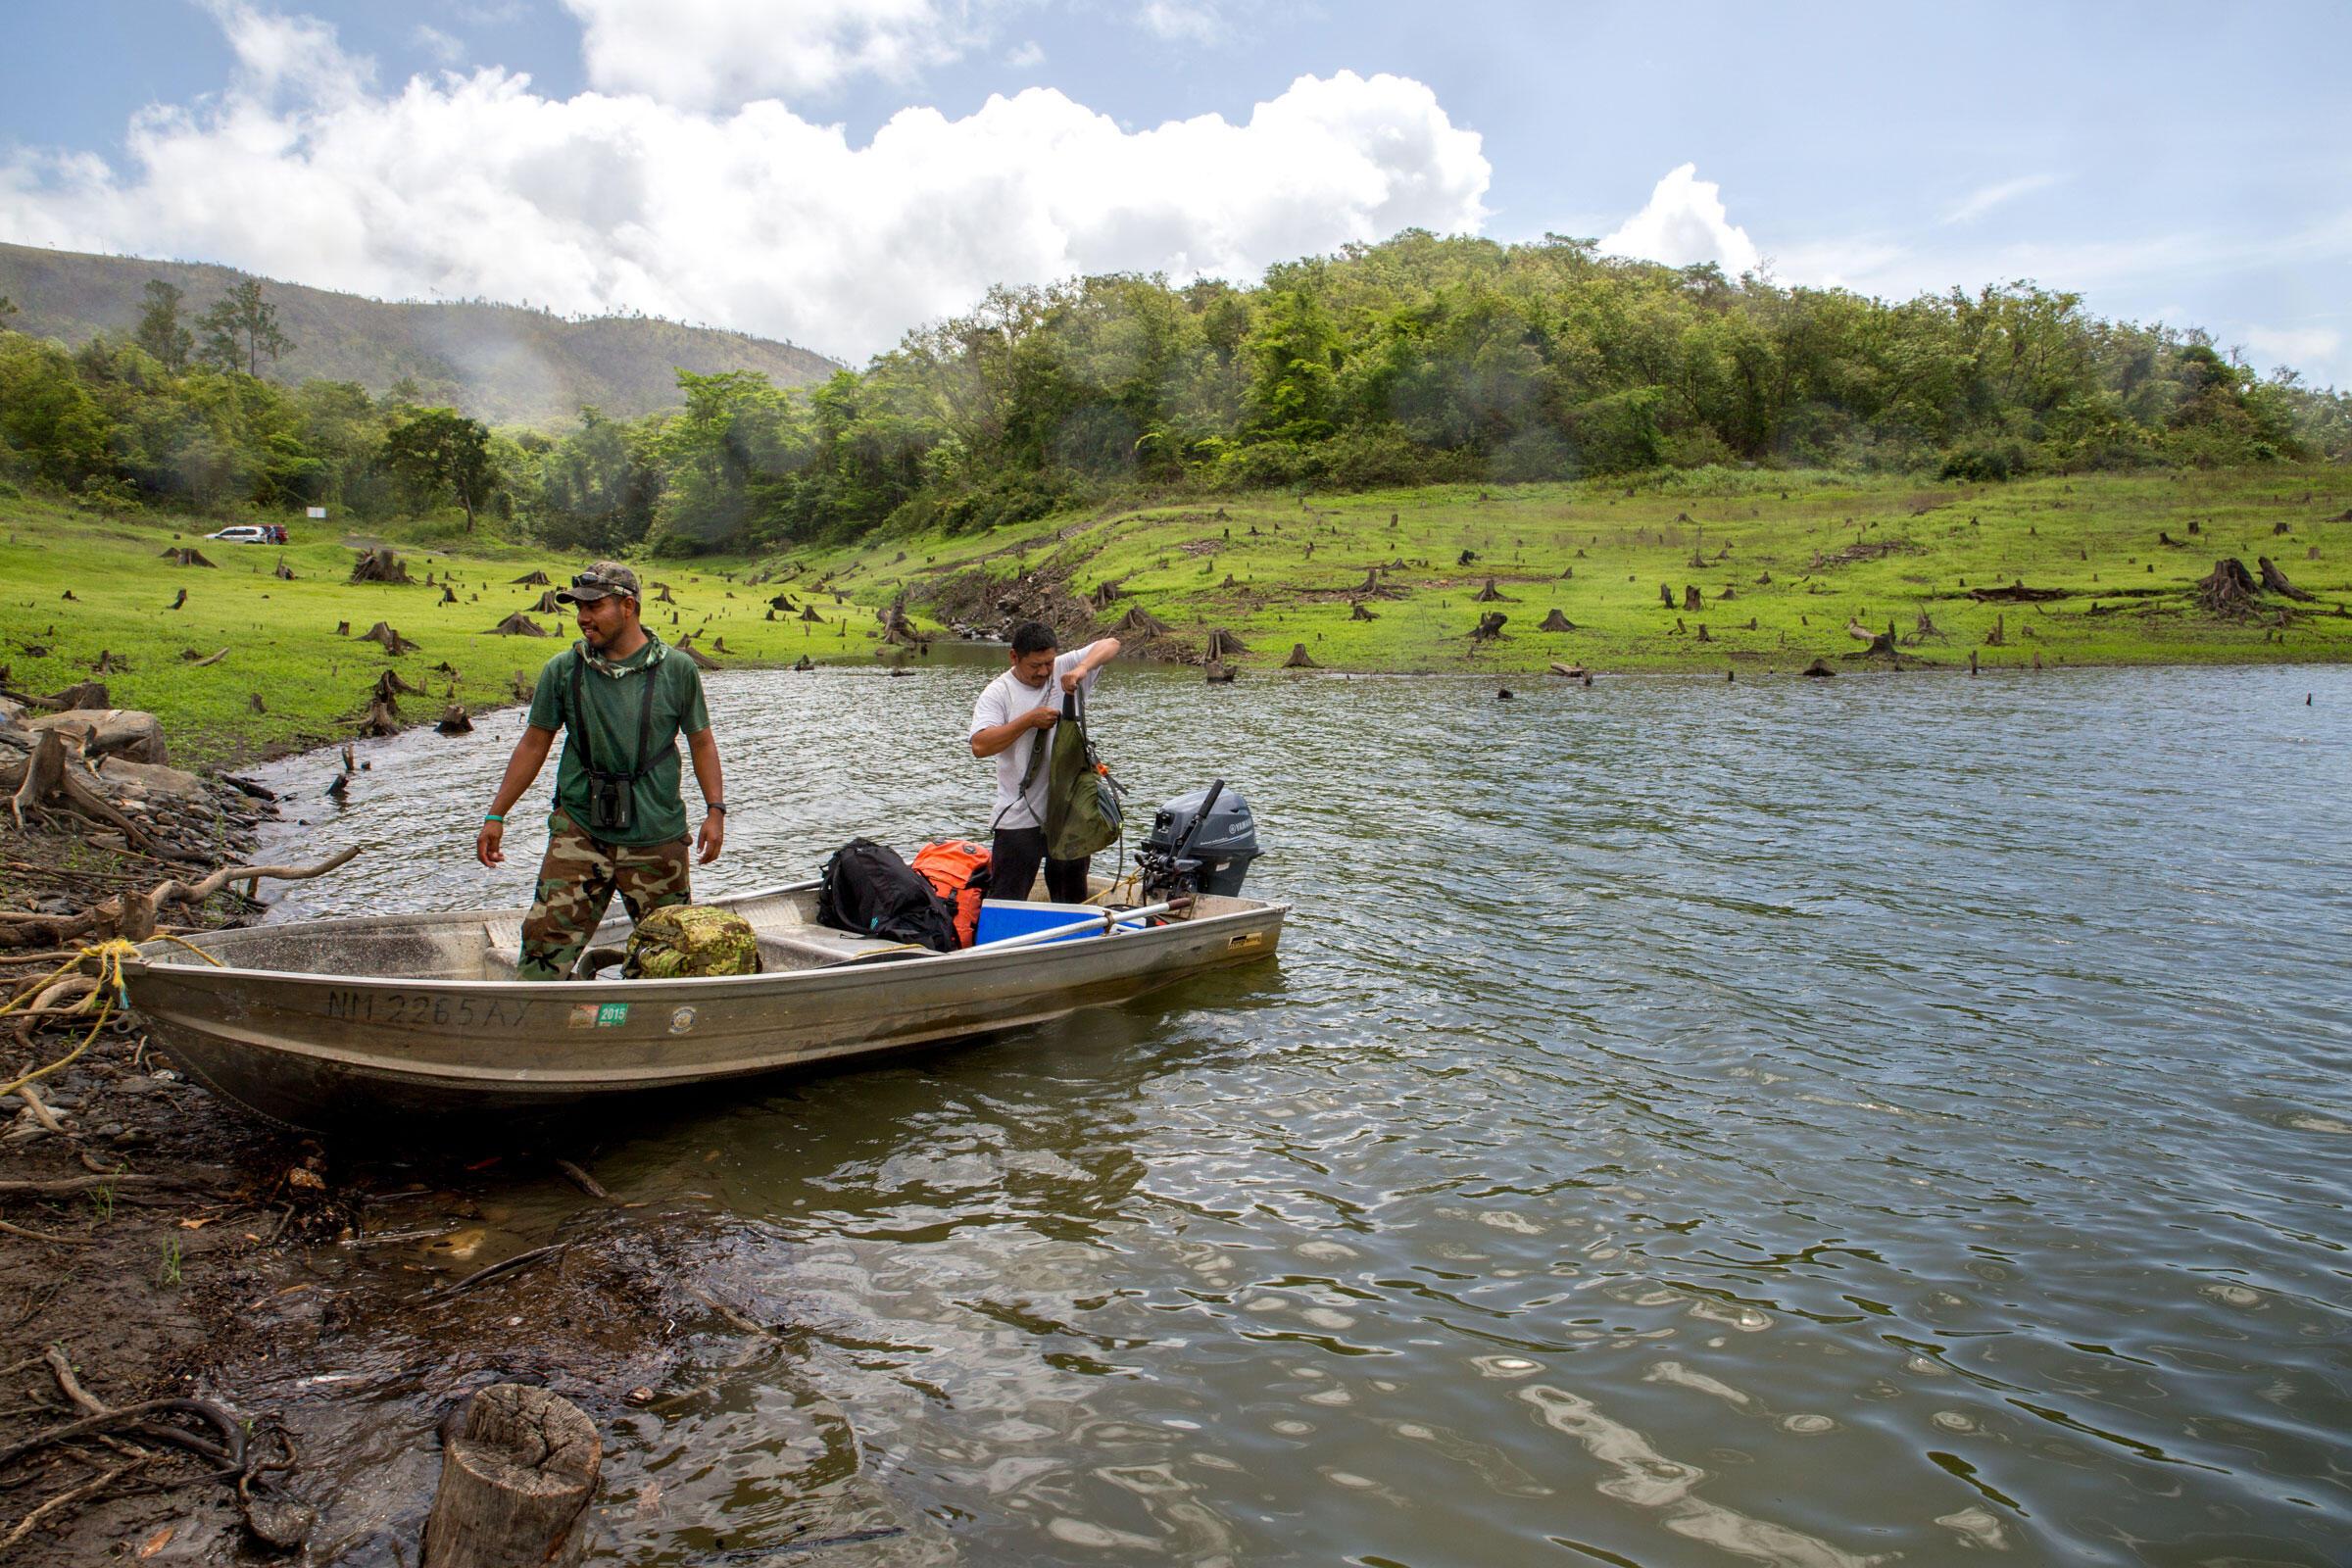 Isael Mai (left) and Luis Mai prepare for the journey upriver. Camilla Cerea/Audubon